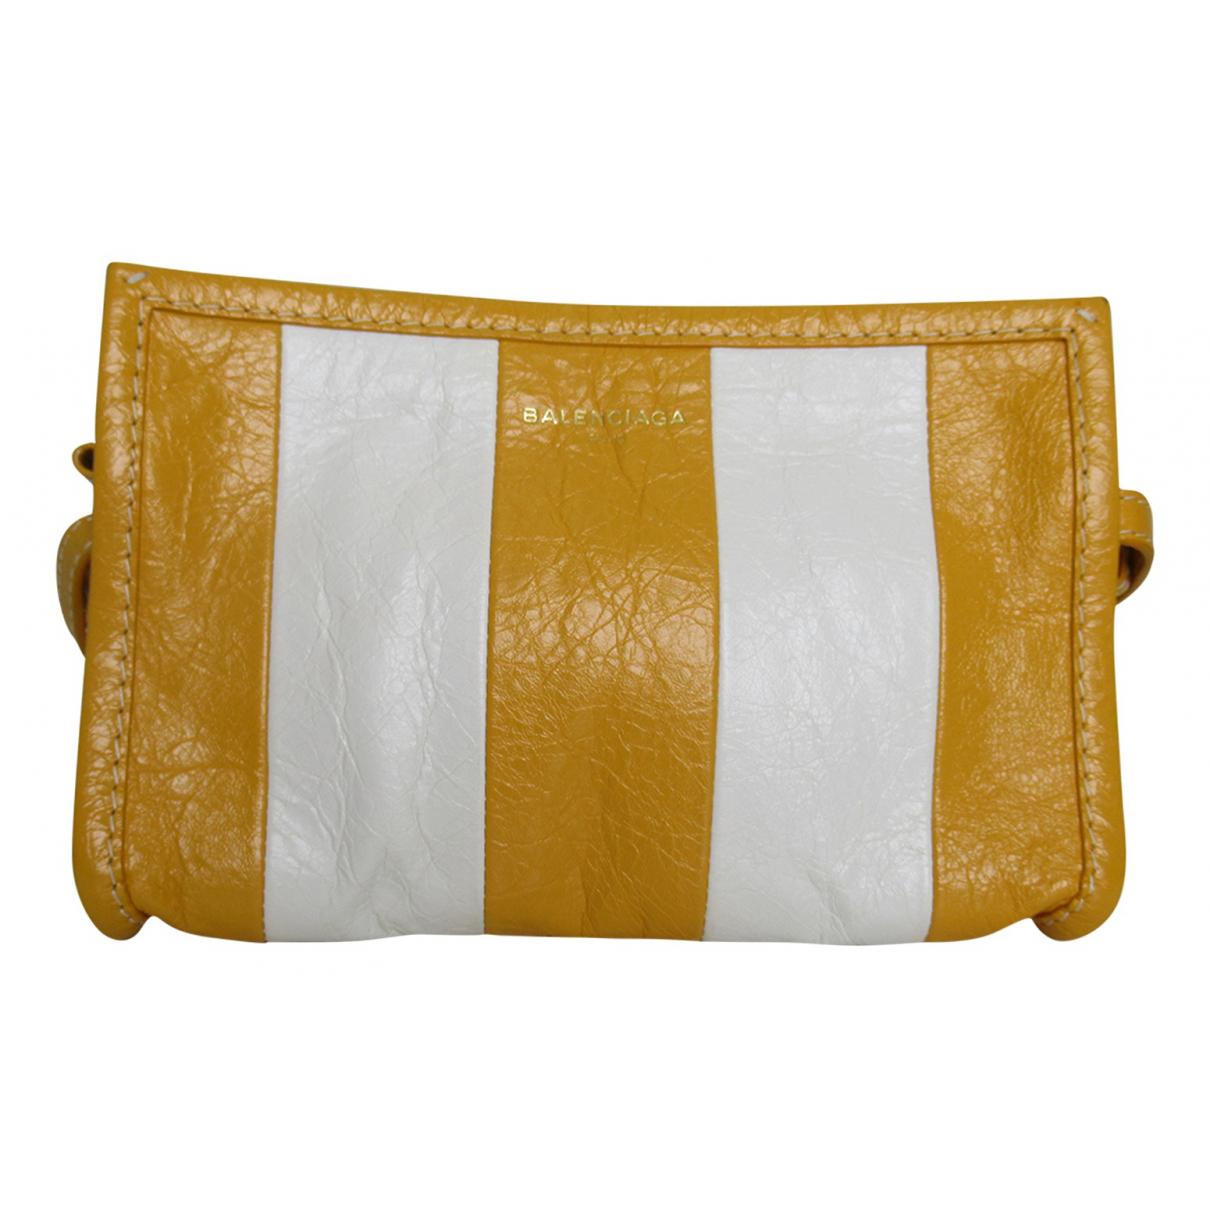 Balenciaga Bazar Bag Multicolour Leather Clutch bag for Women N